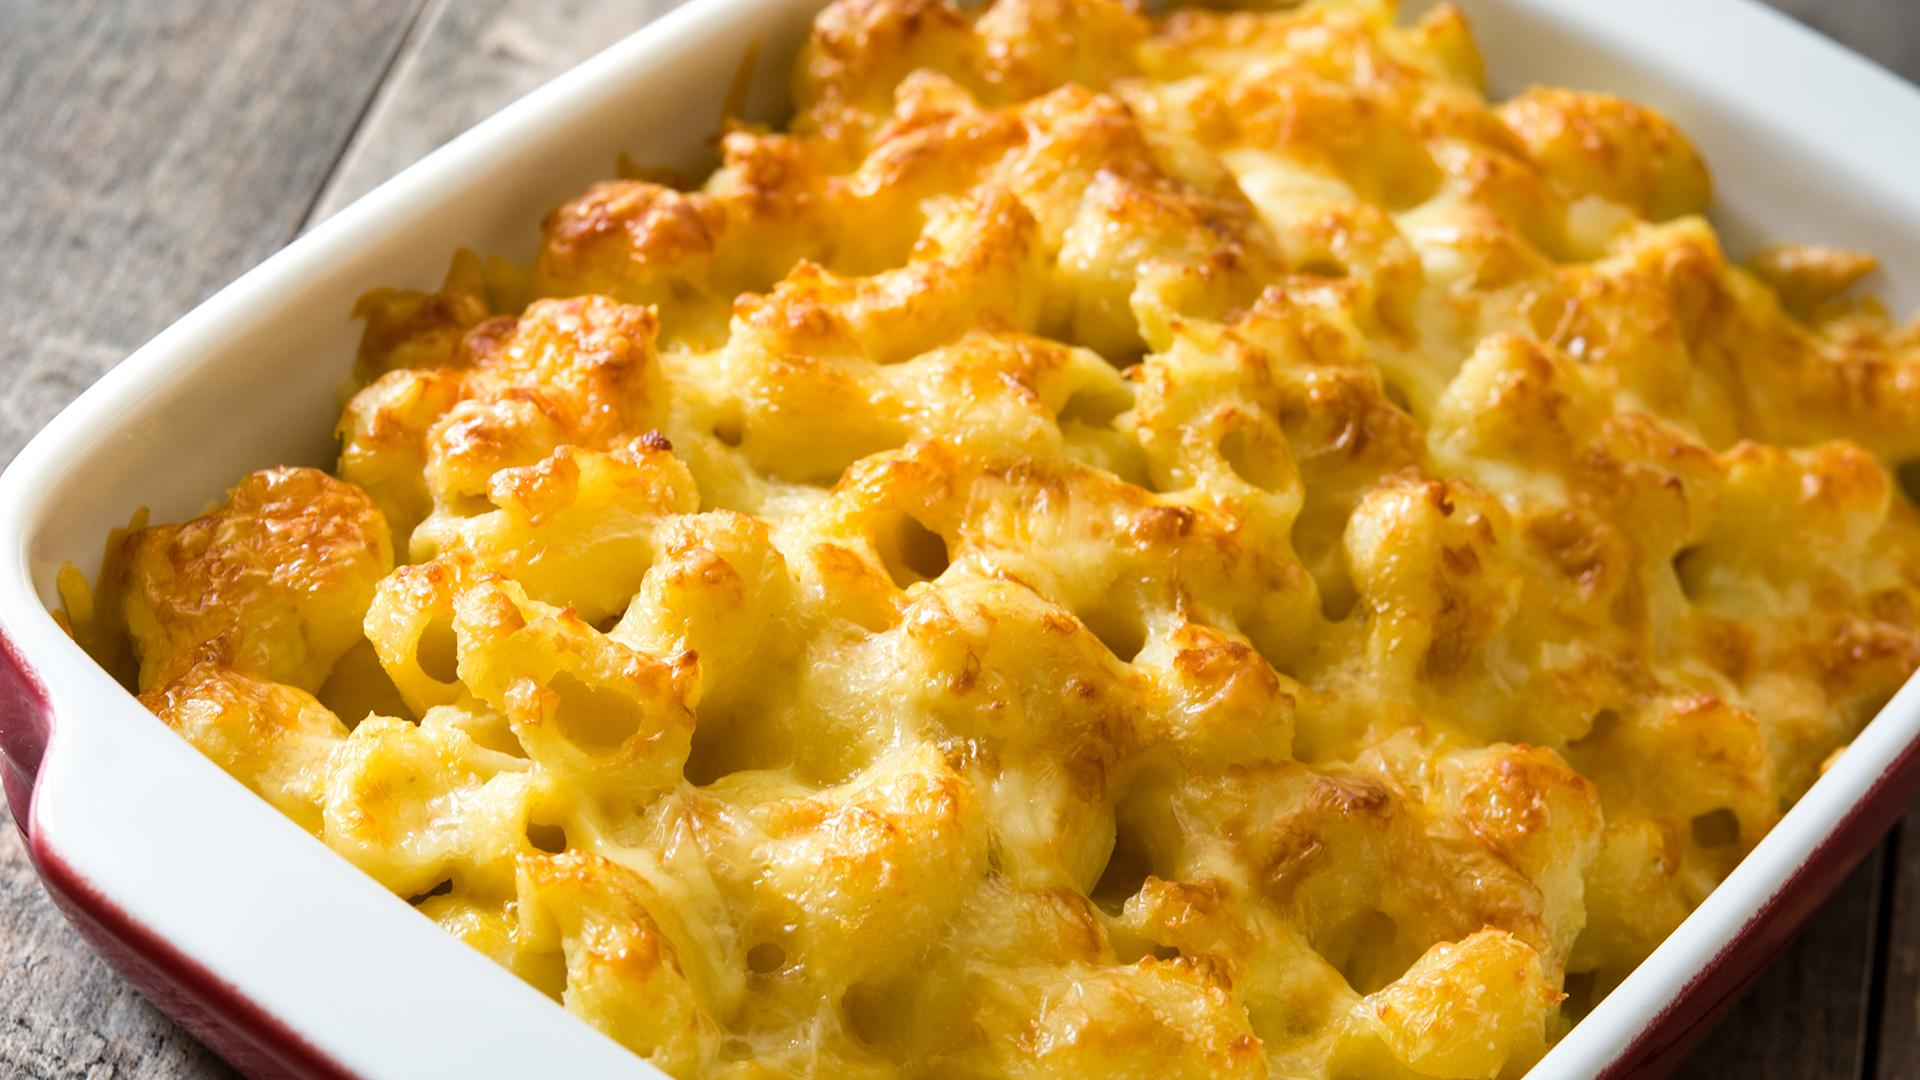 Freezer-To-Oven Mac 'n' Cheese